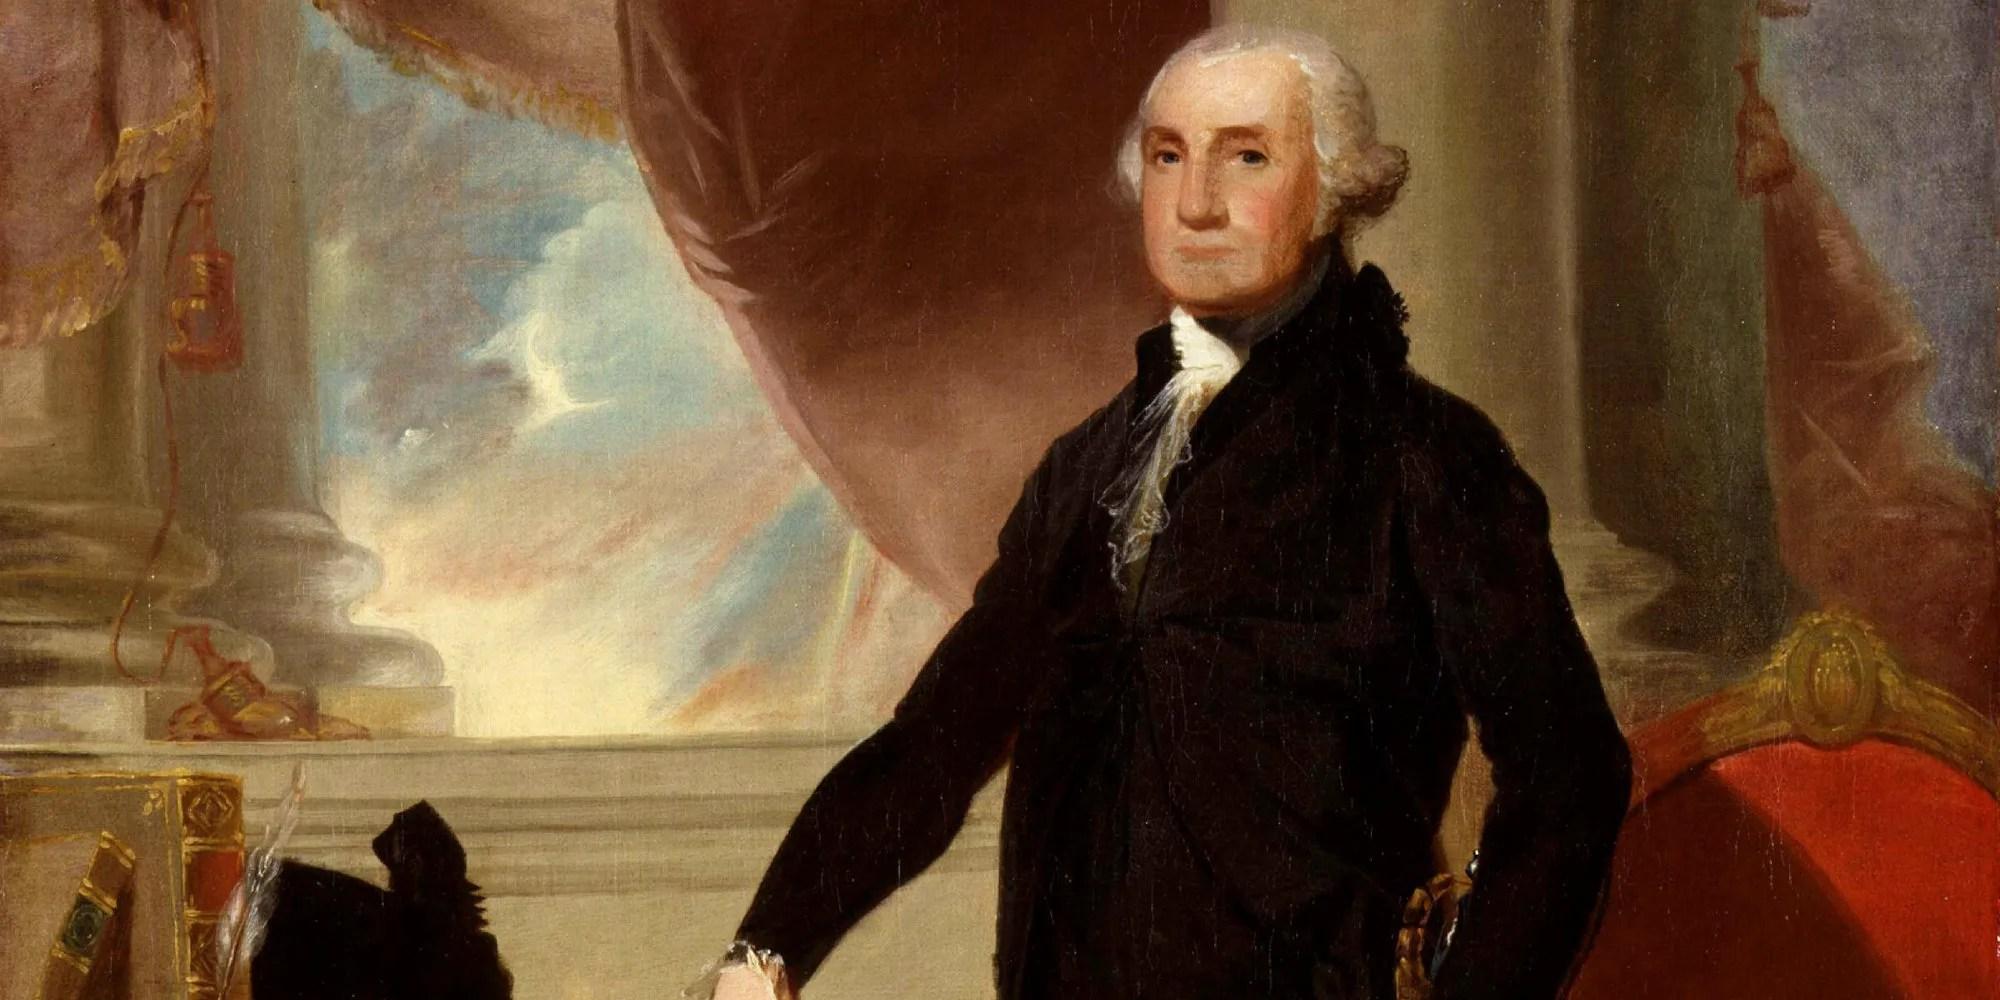 George Washington Biopic Gets A Director